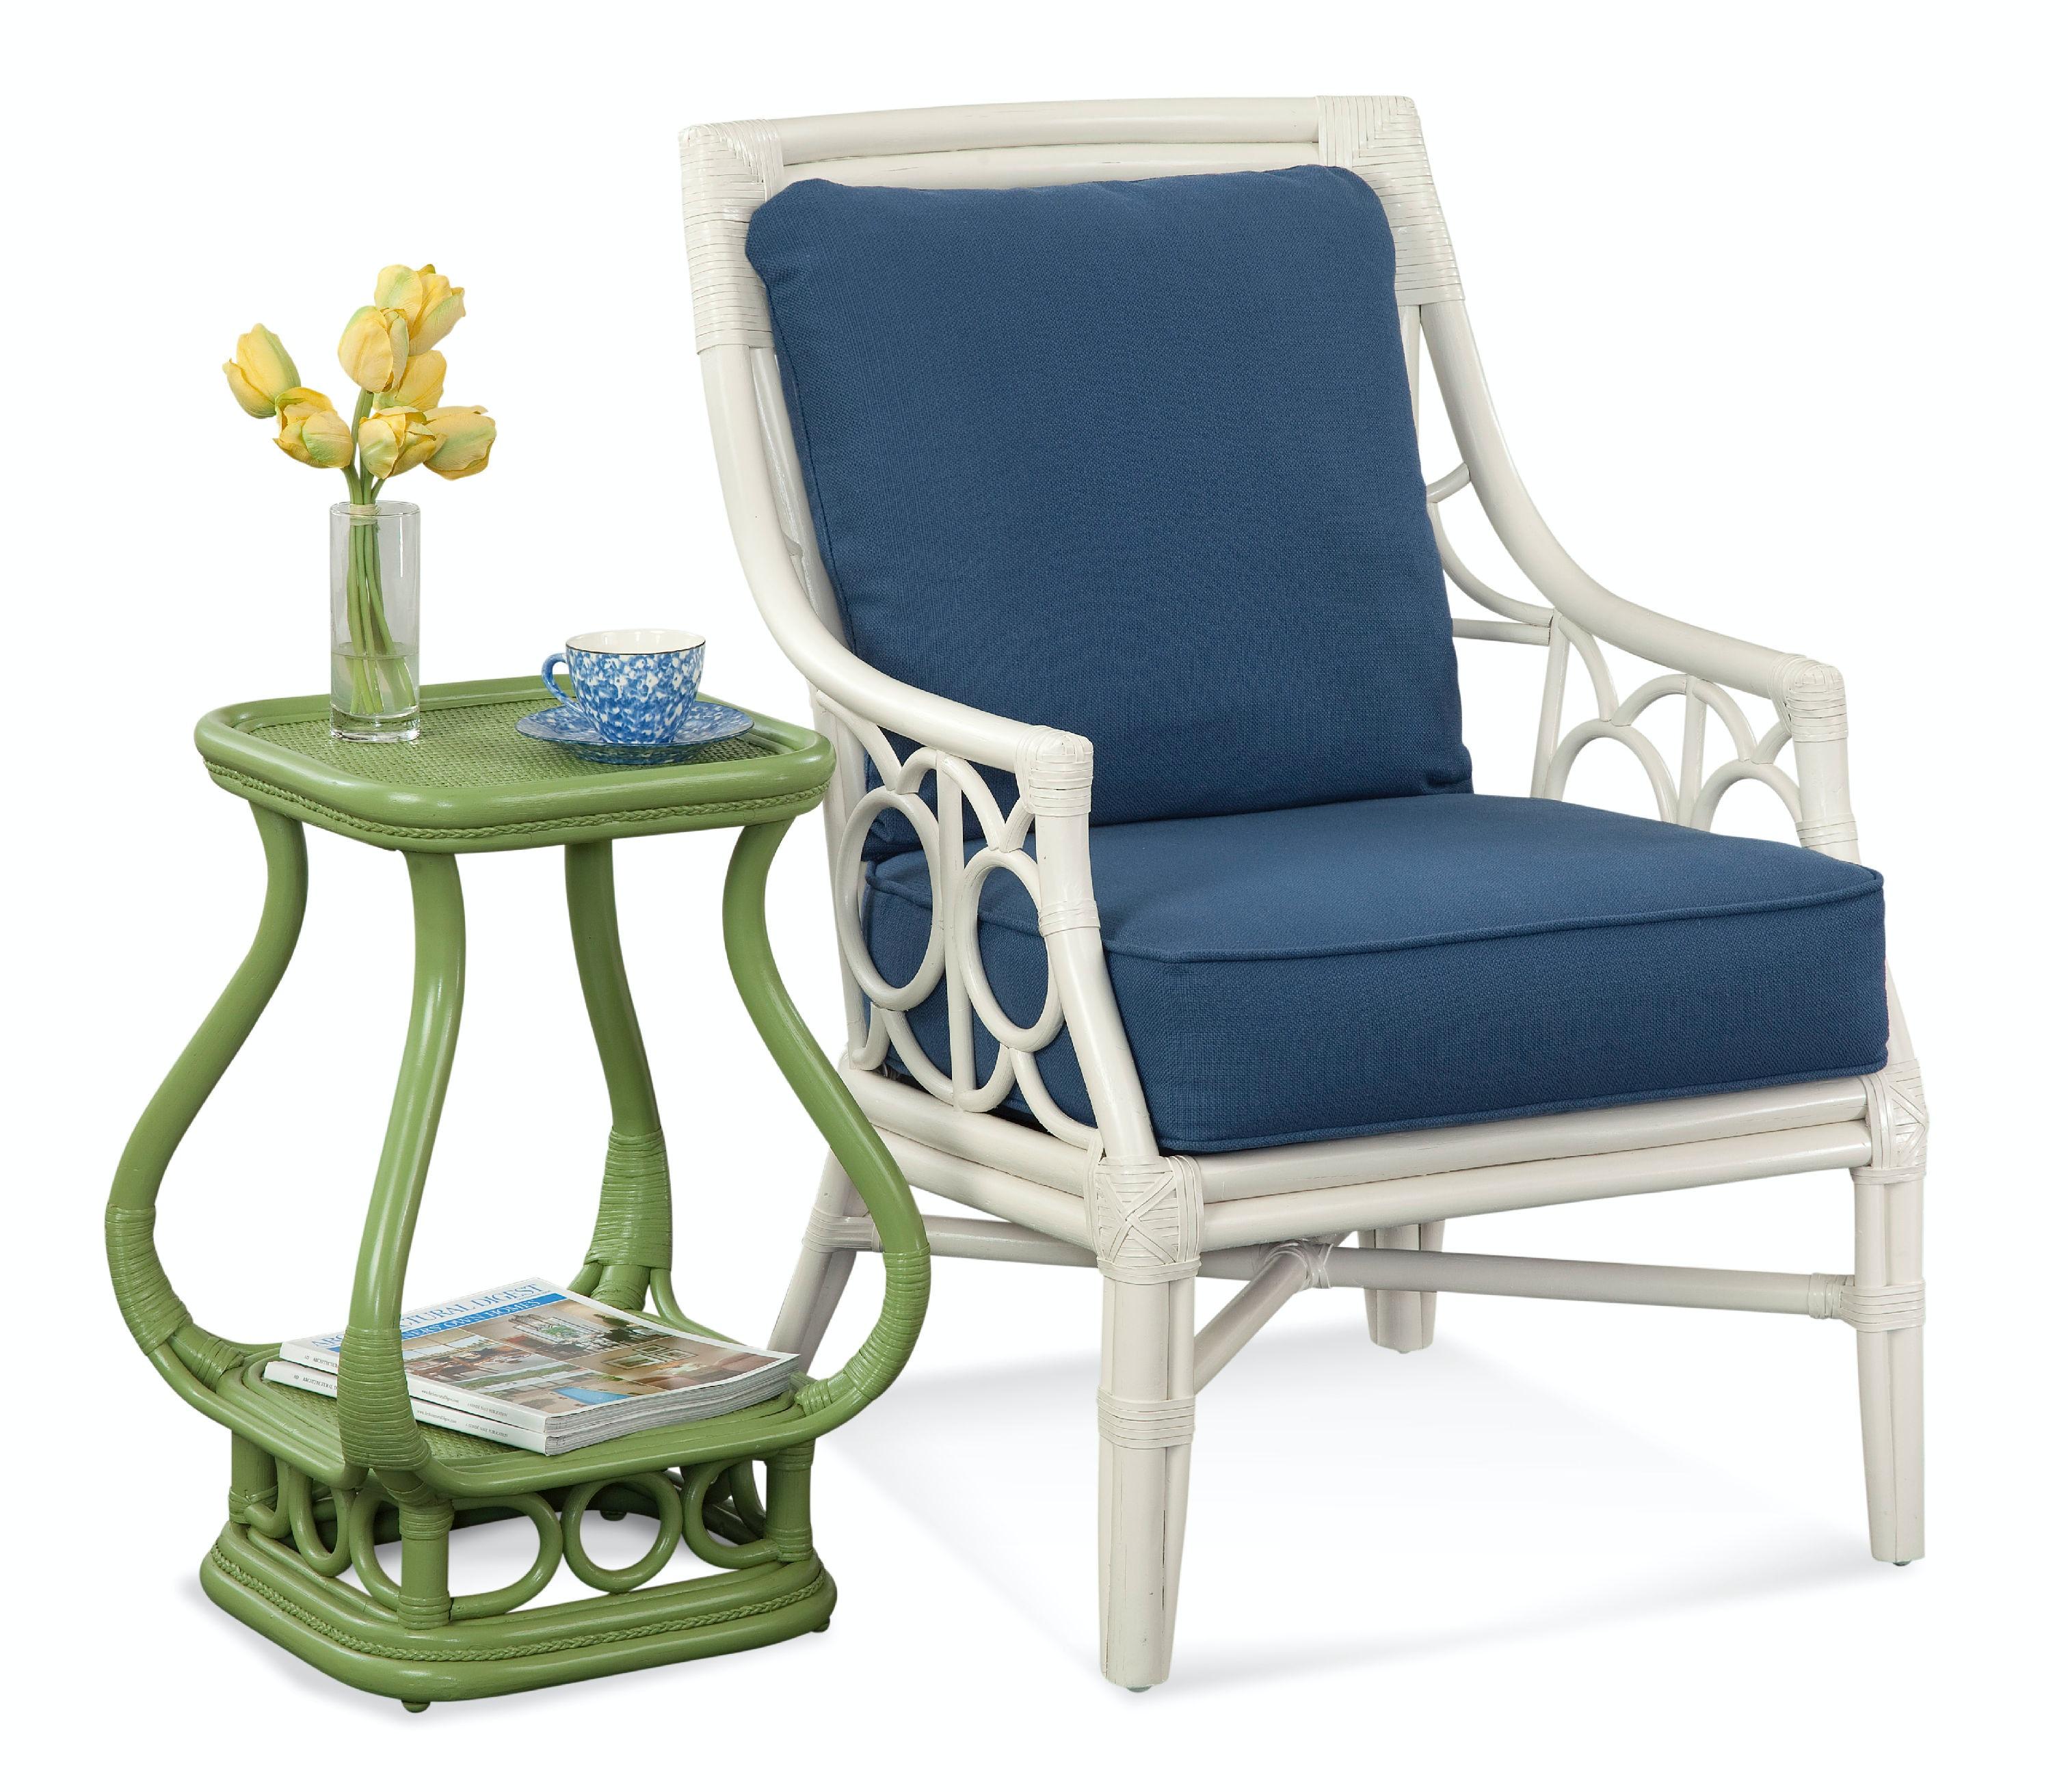 Bimini Chair 1082-001